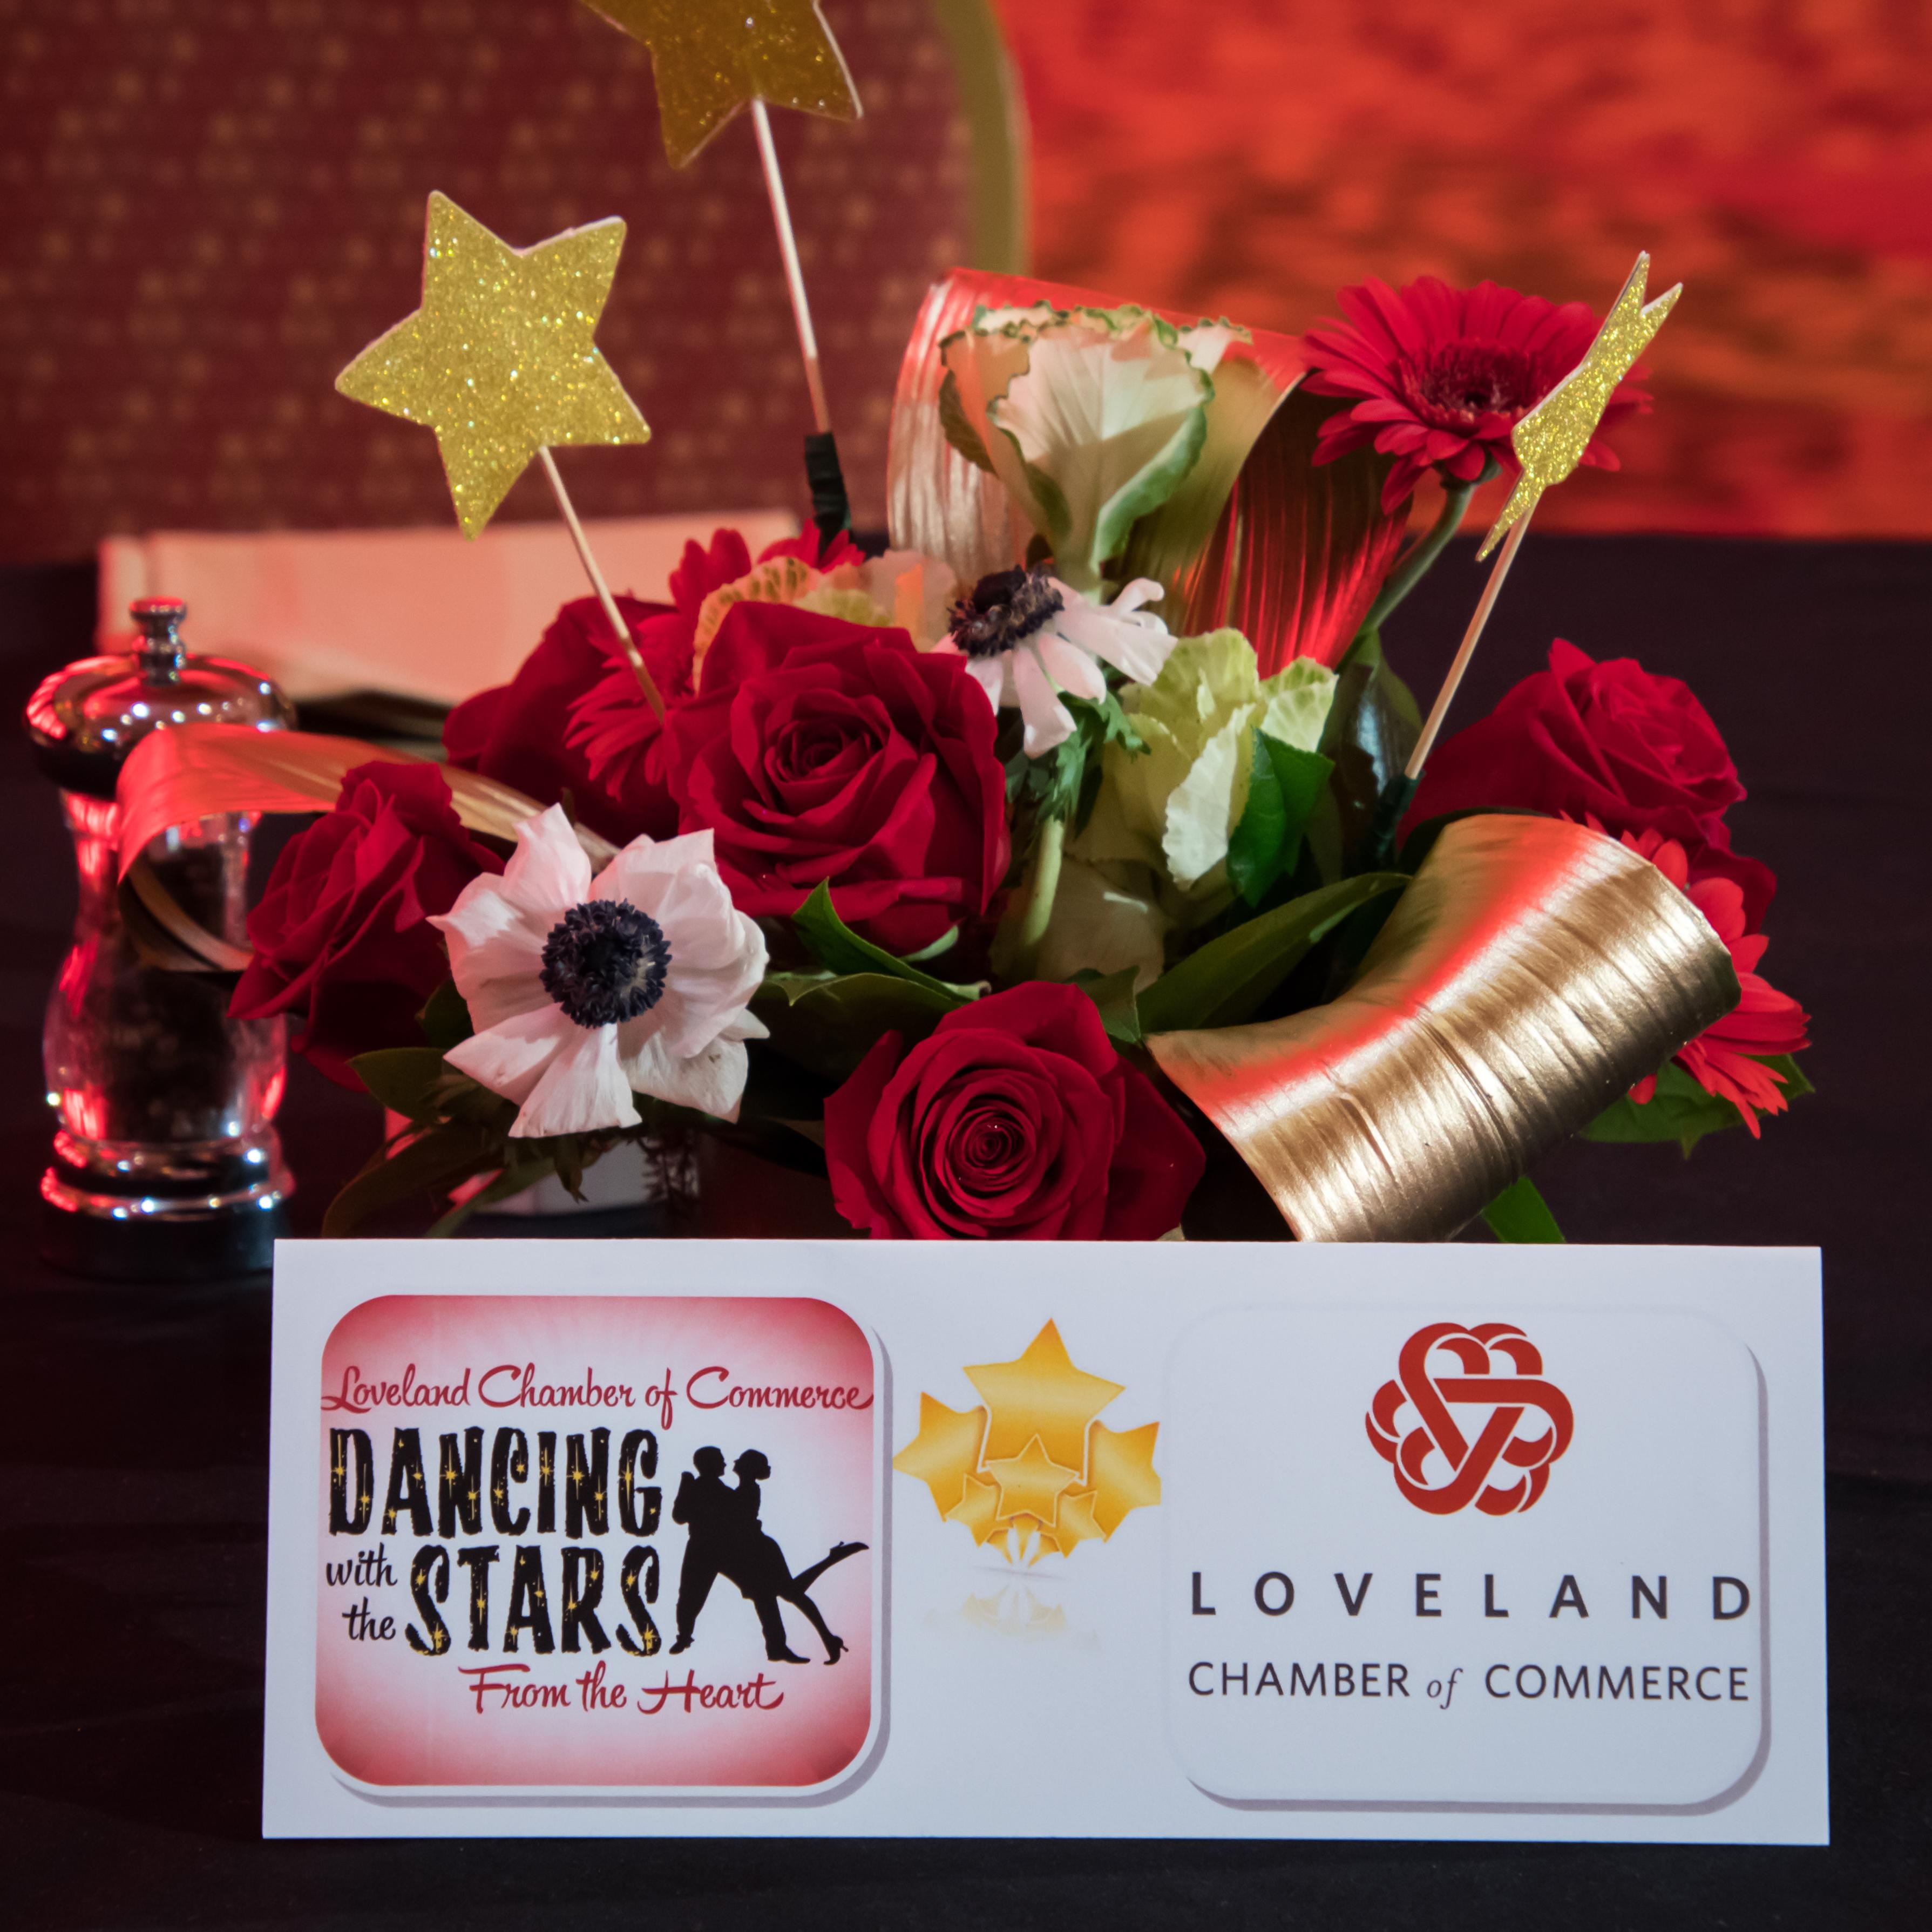 DancingStars2018-6879